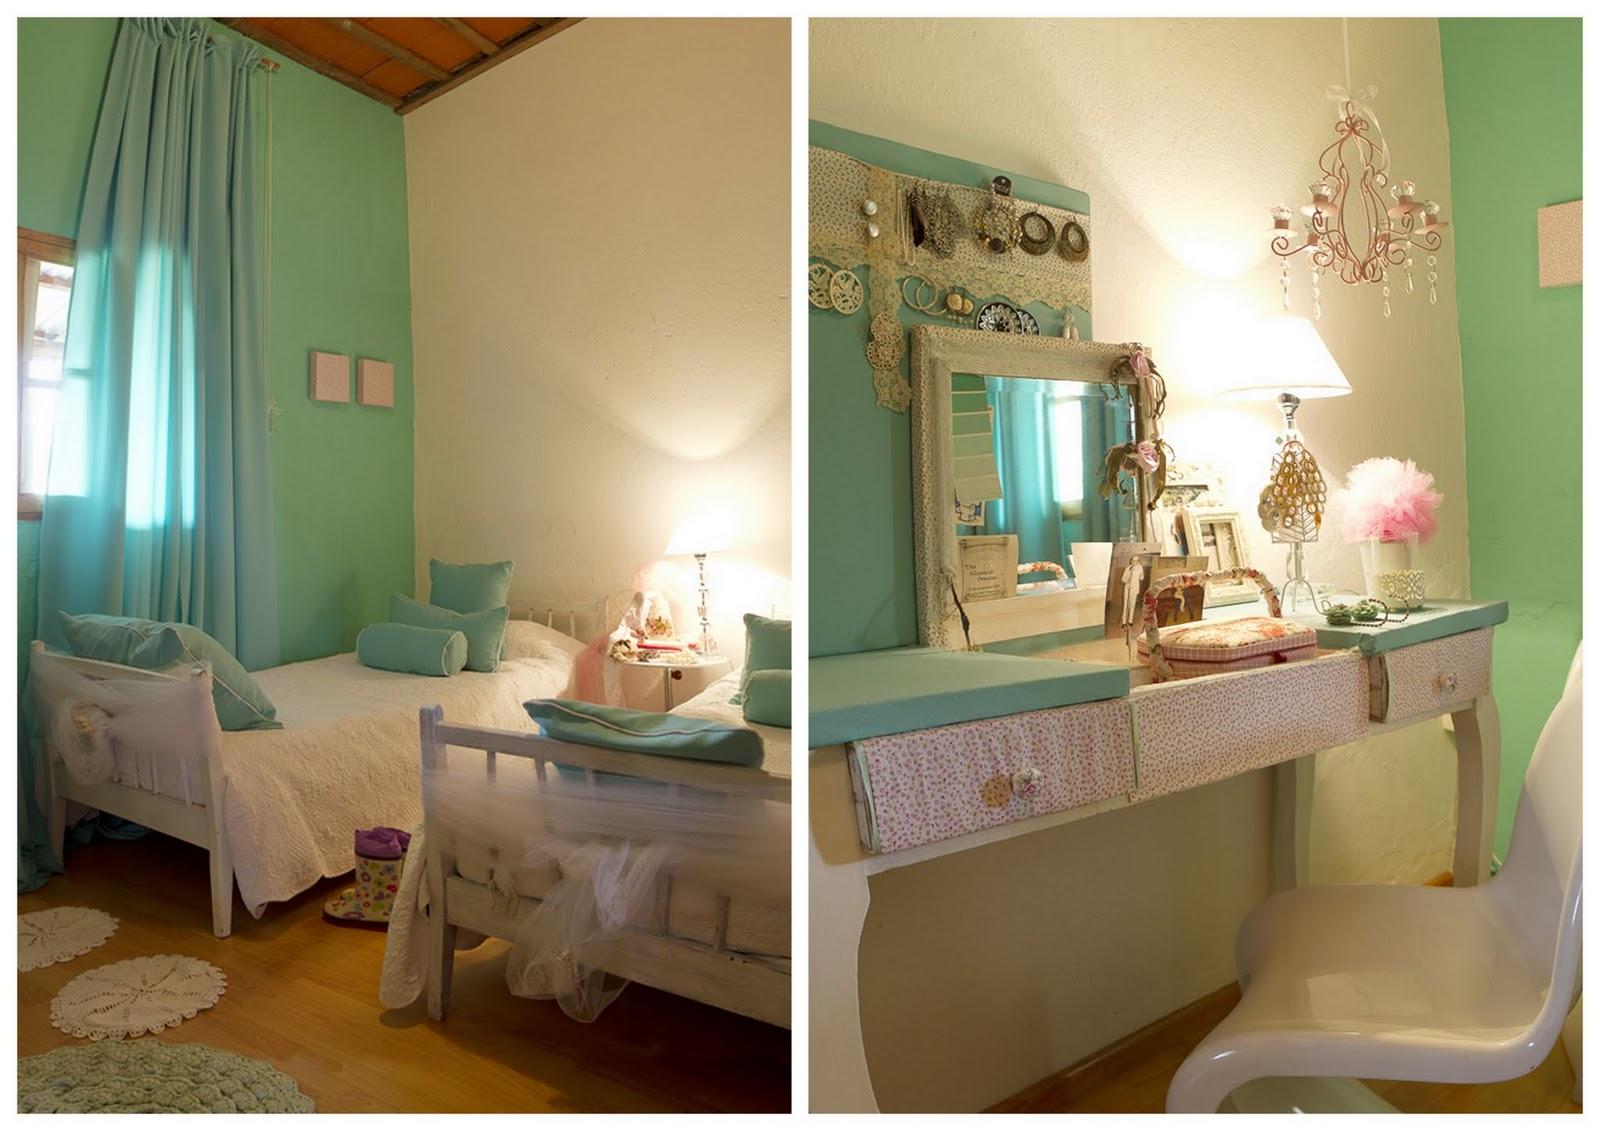 Hogar dulce hogar el sue o de valeria se hizo realidad for Dormitorio verde agua